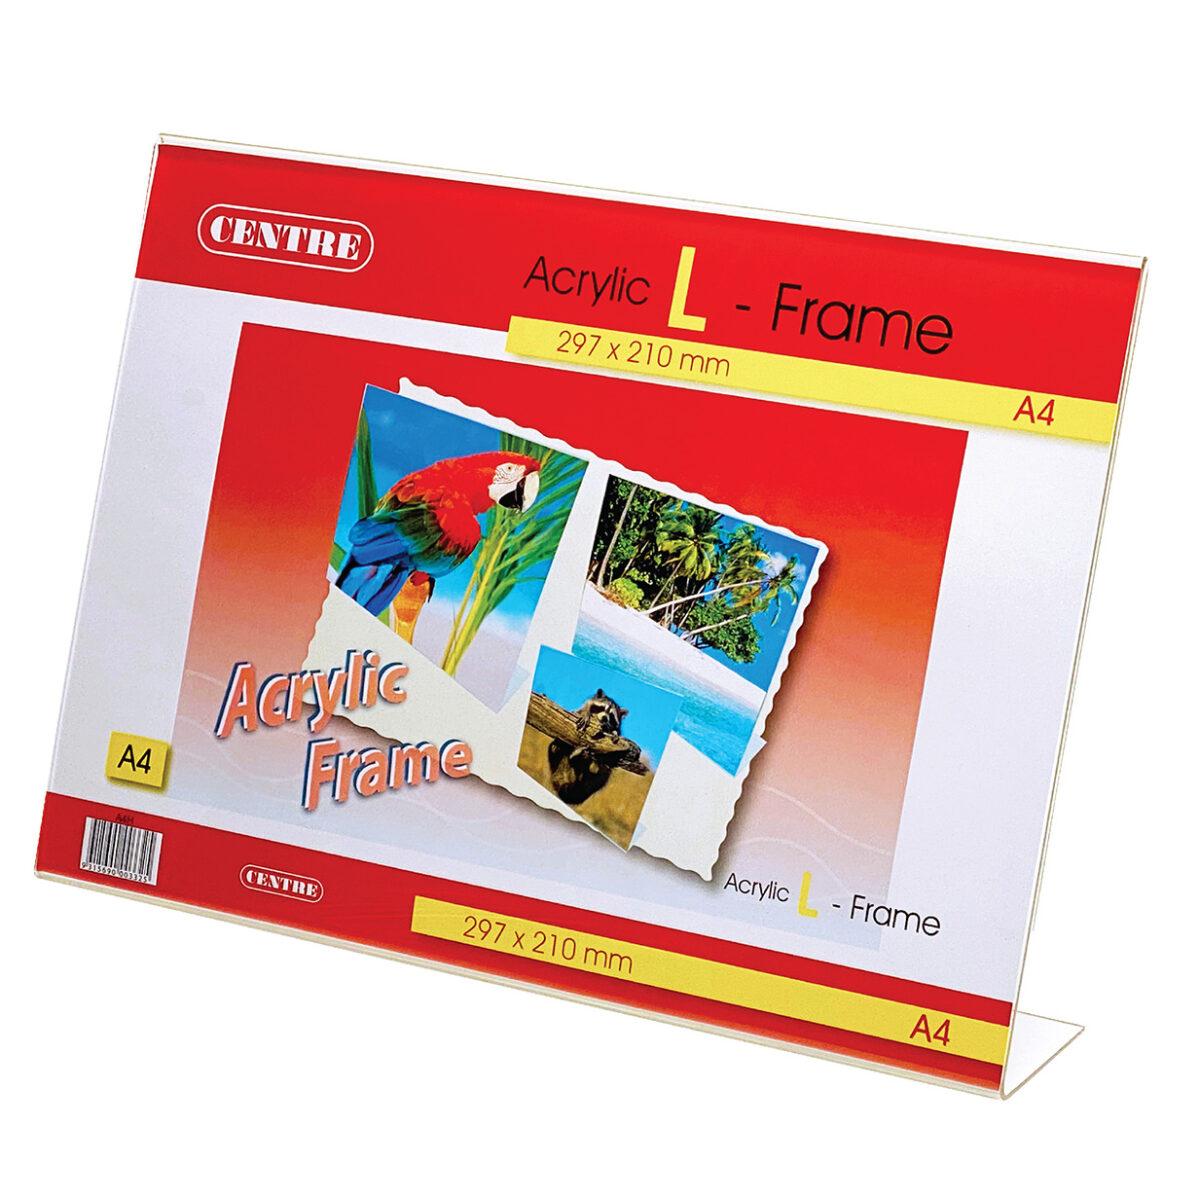 Centre Acrylic Picture Frame - L Stand Landscape A4